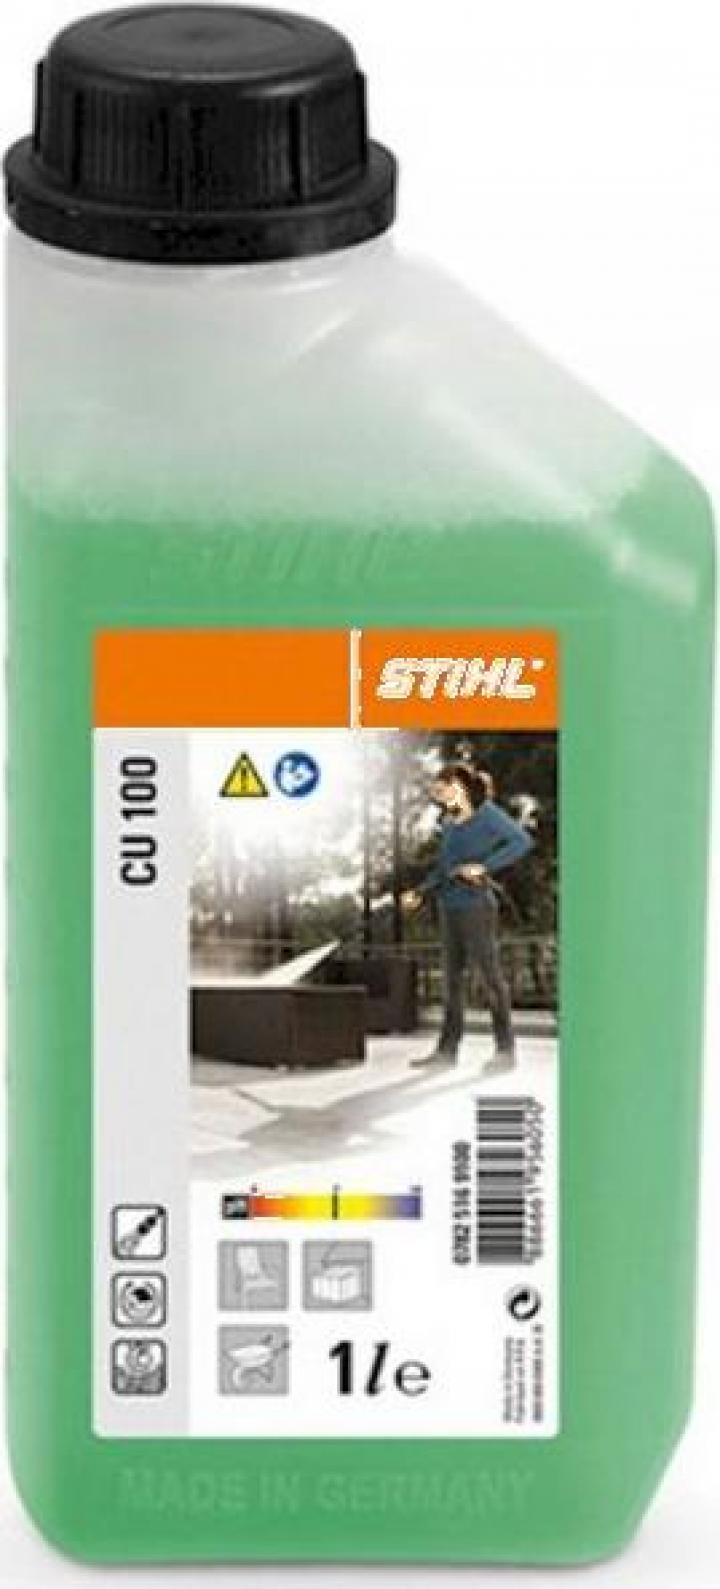 Detergent universal Stihl CU 100, 1 litru